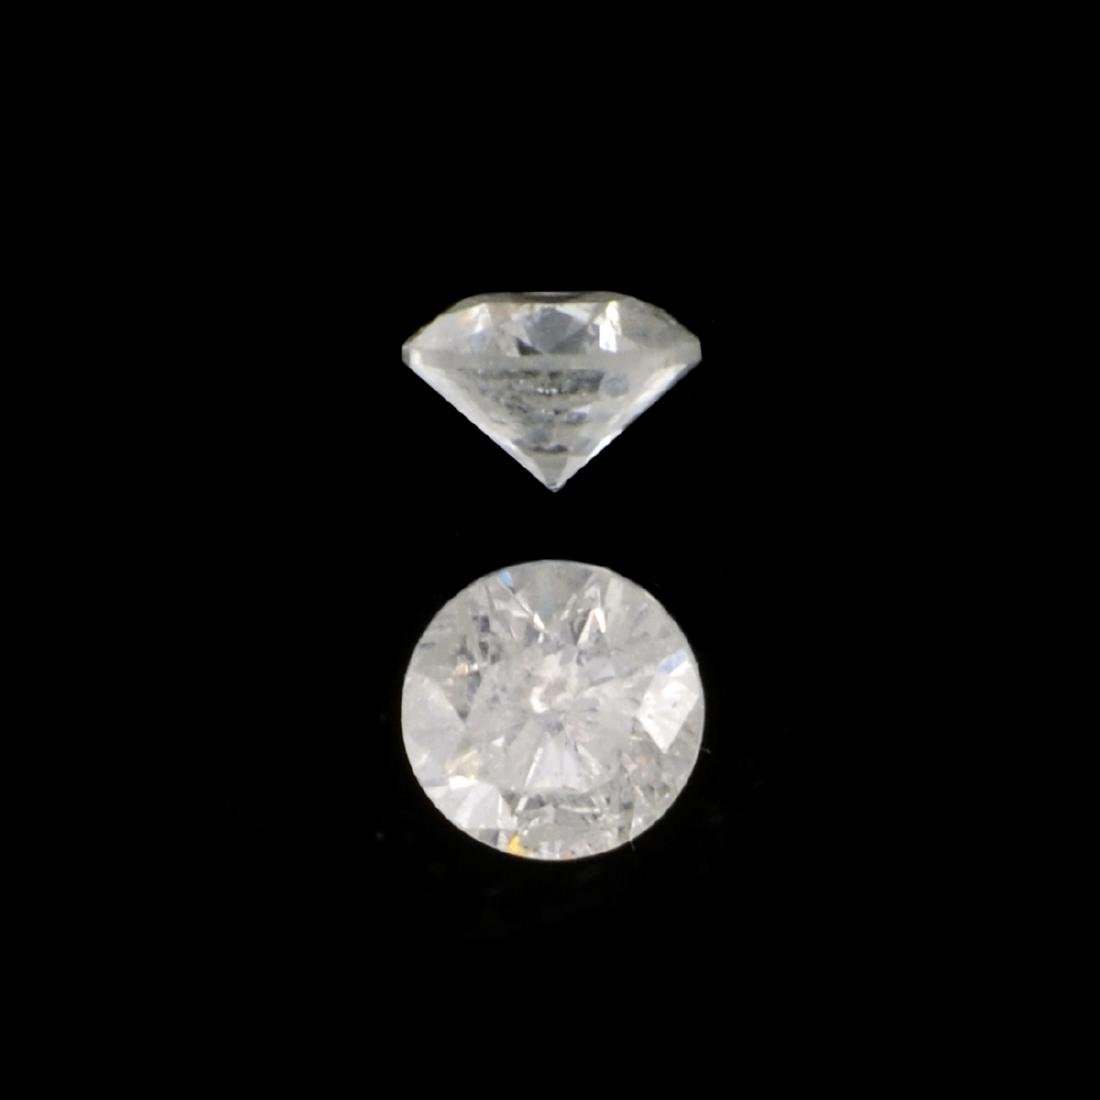 APP: 0.4k 0.15CT Round Brilliant Cut Diamond Gemstone